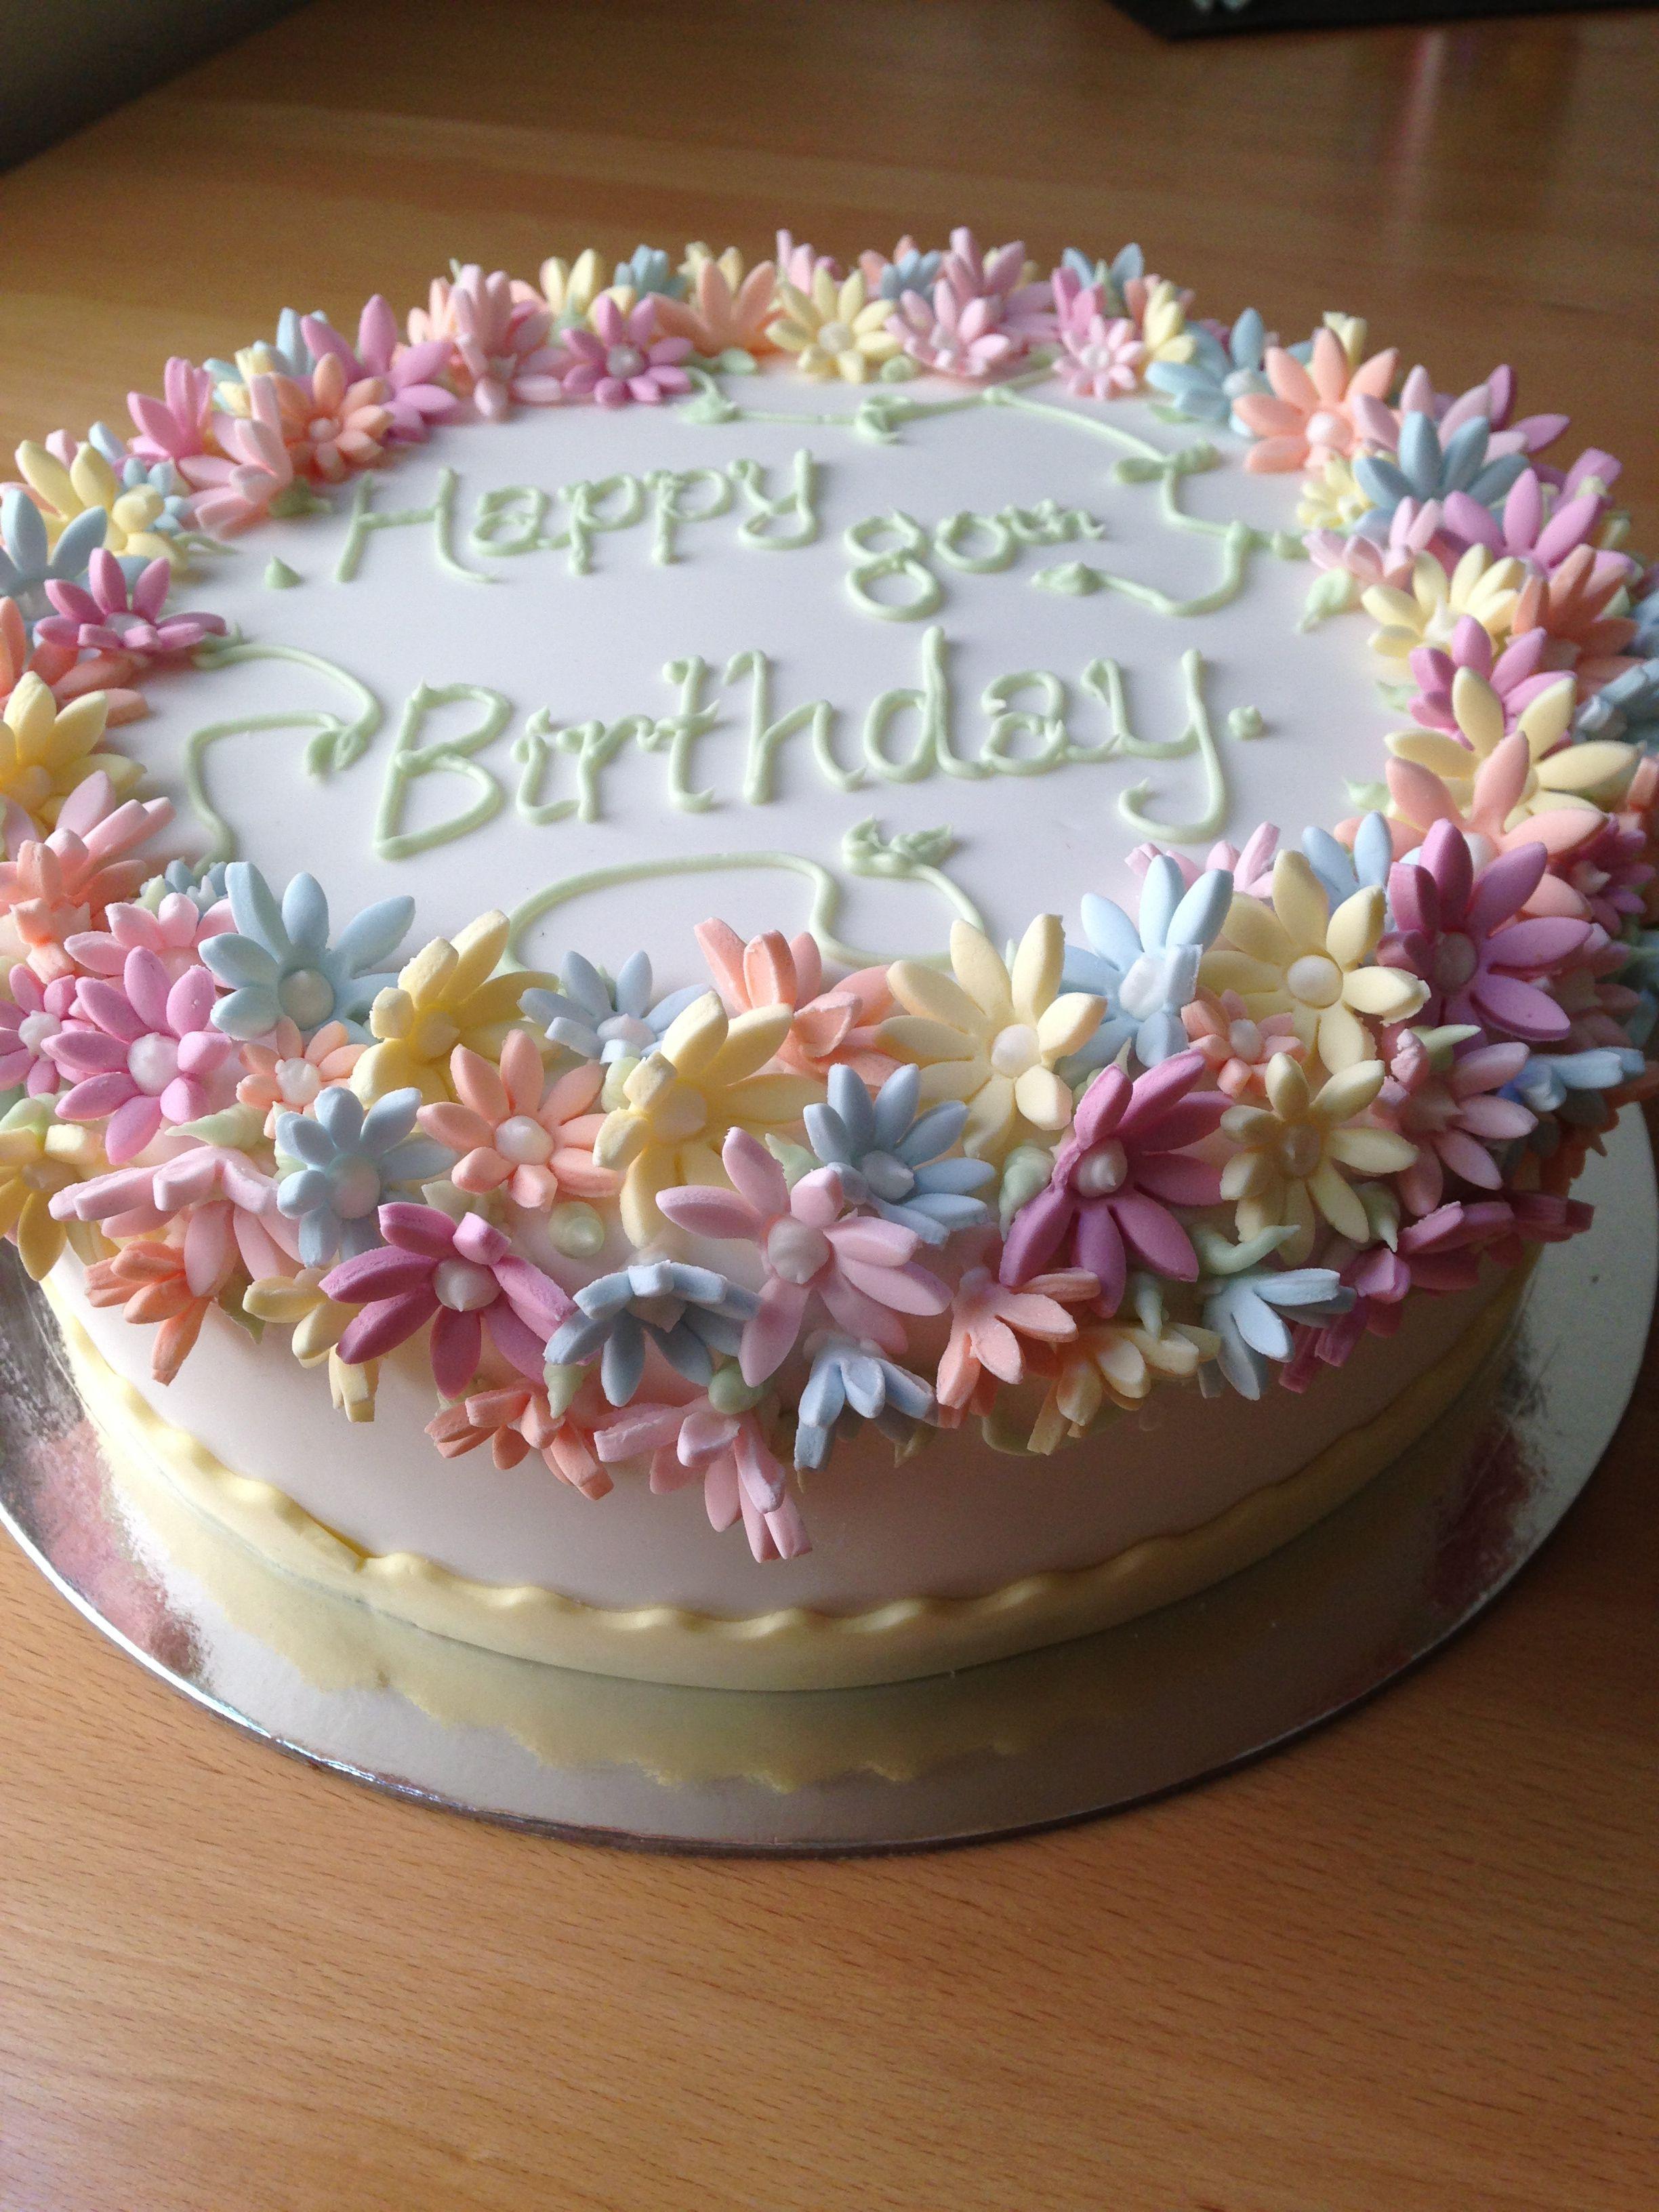 My Nans 80th birthday cake that I made fondant flowers